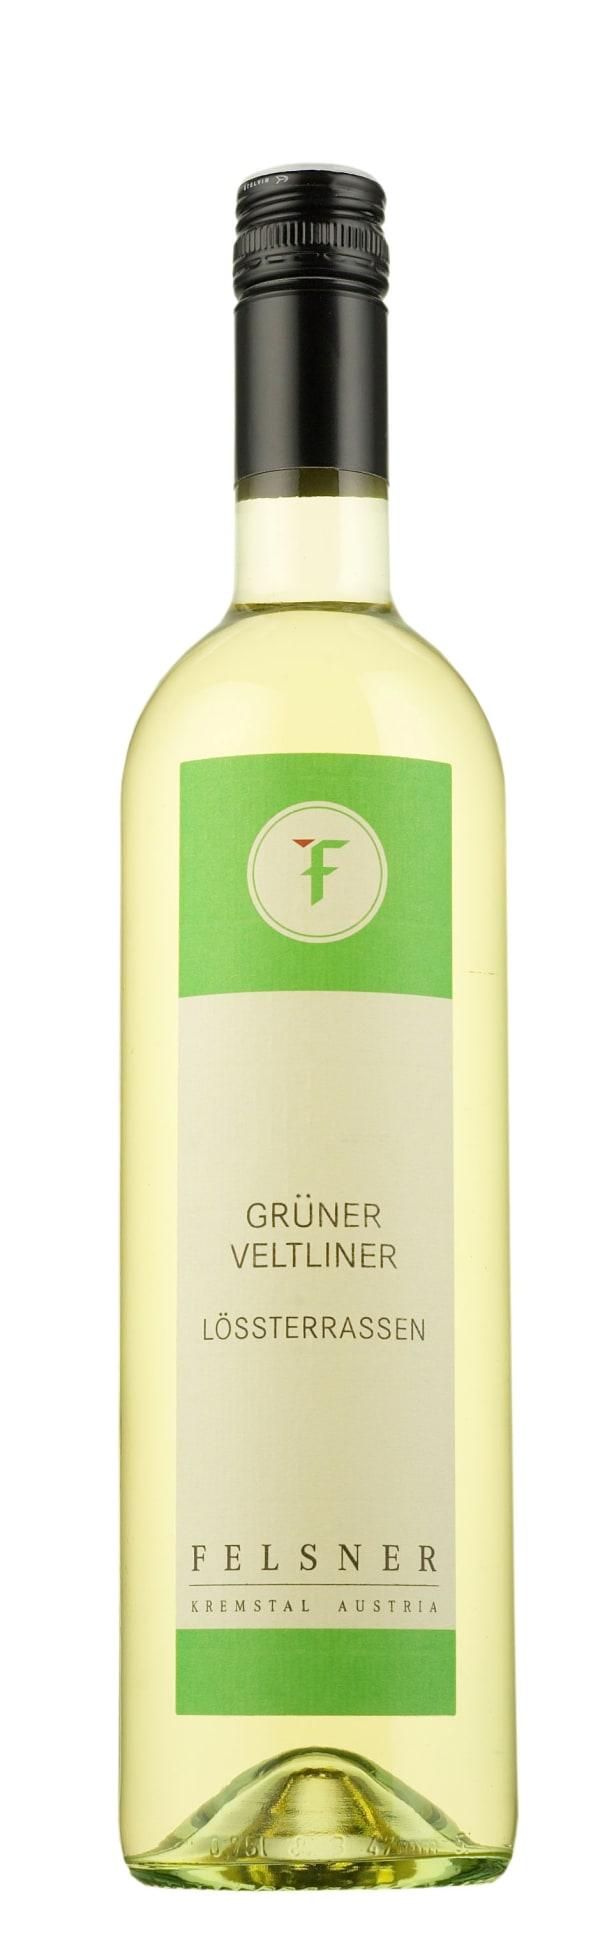 Felsner Lössterrassen Grüner Veltliner 2017